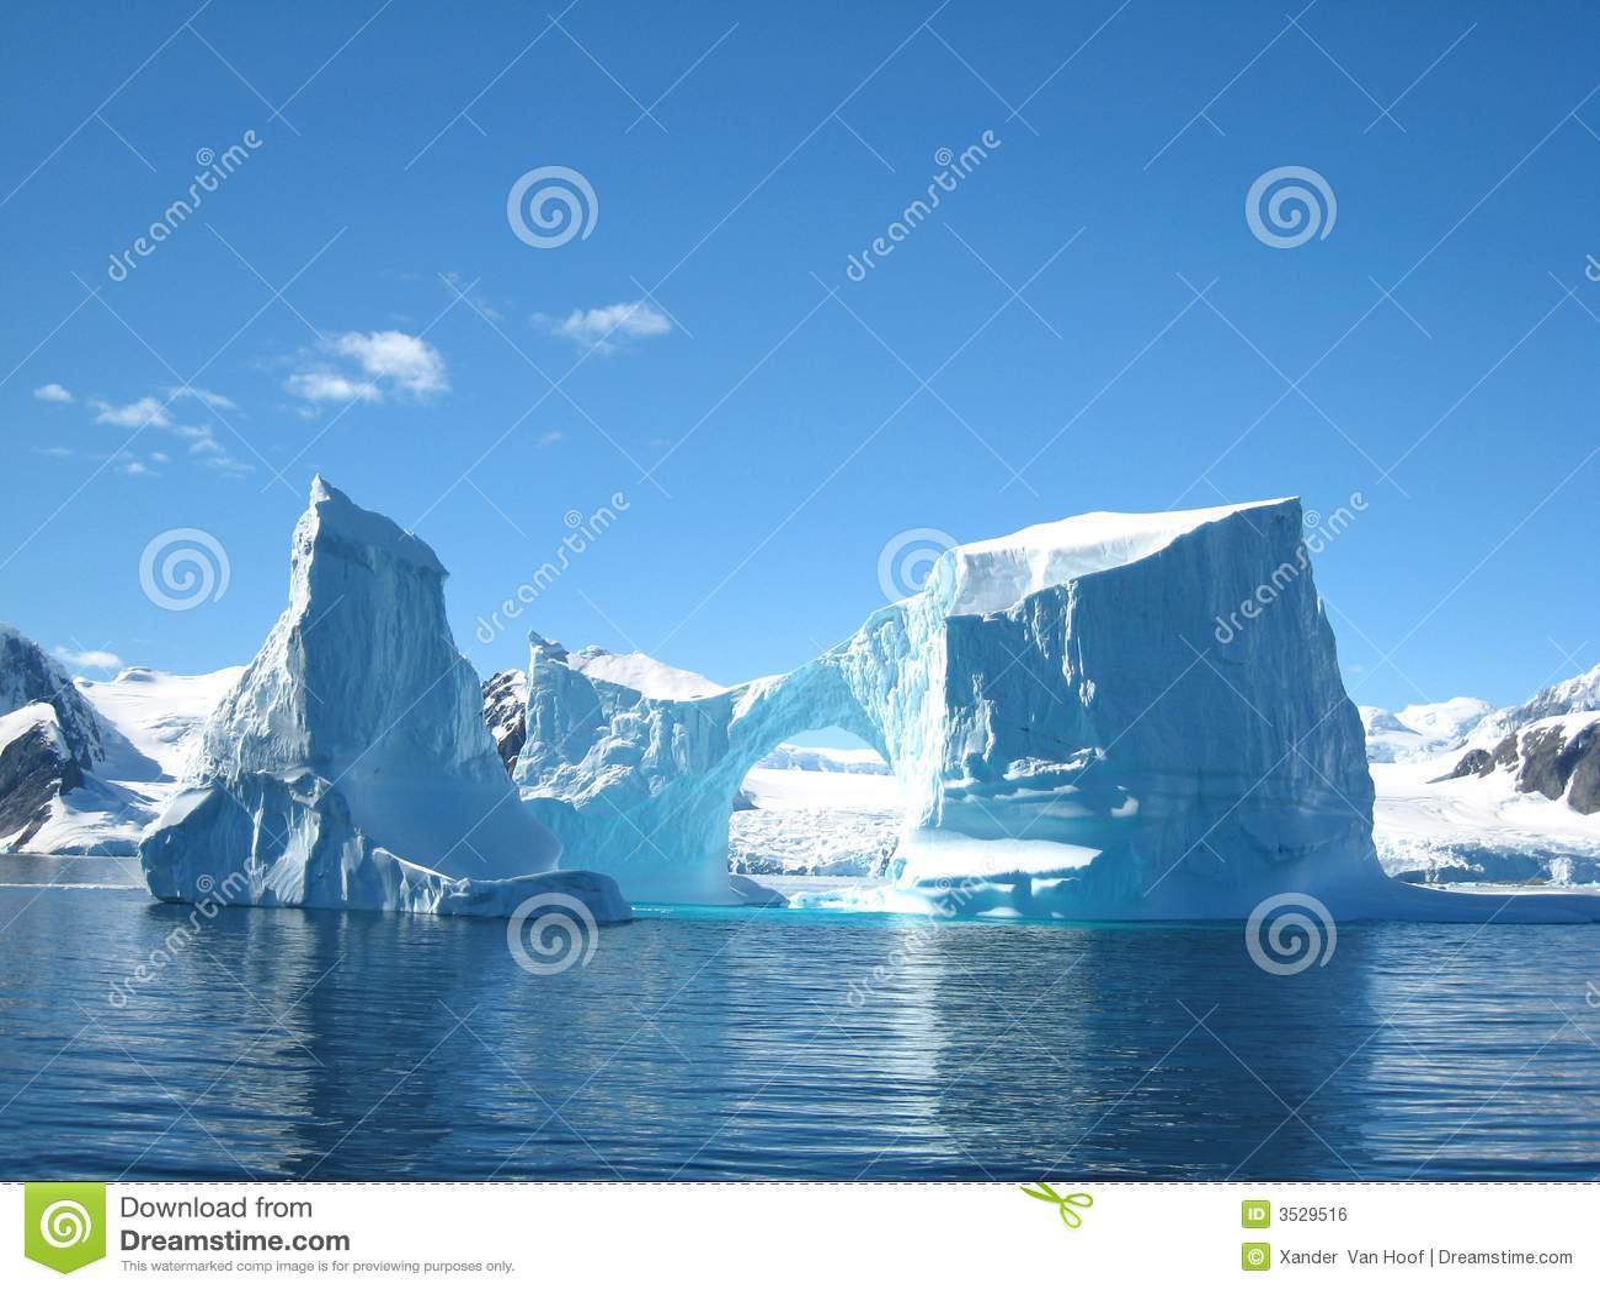 Iceberg sculpture